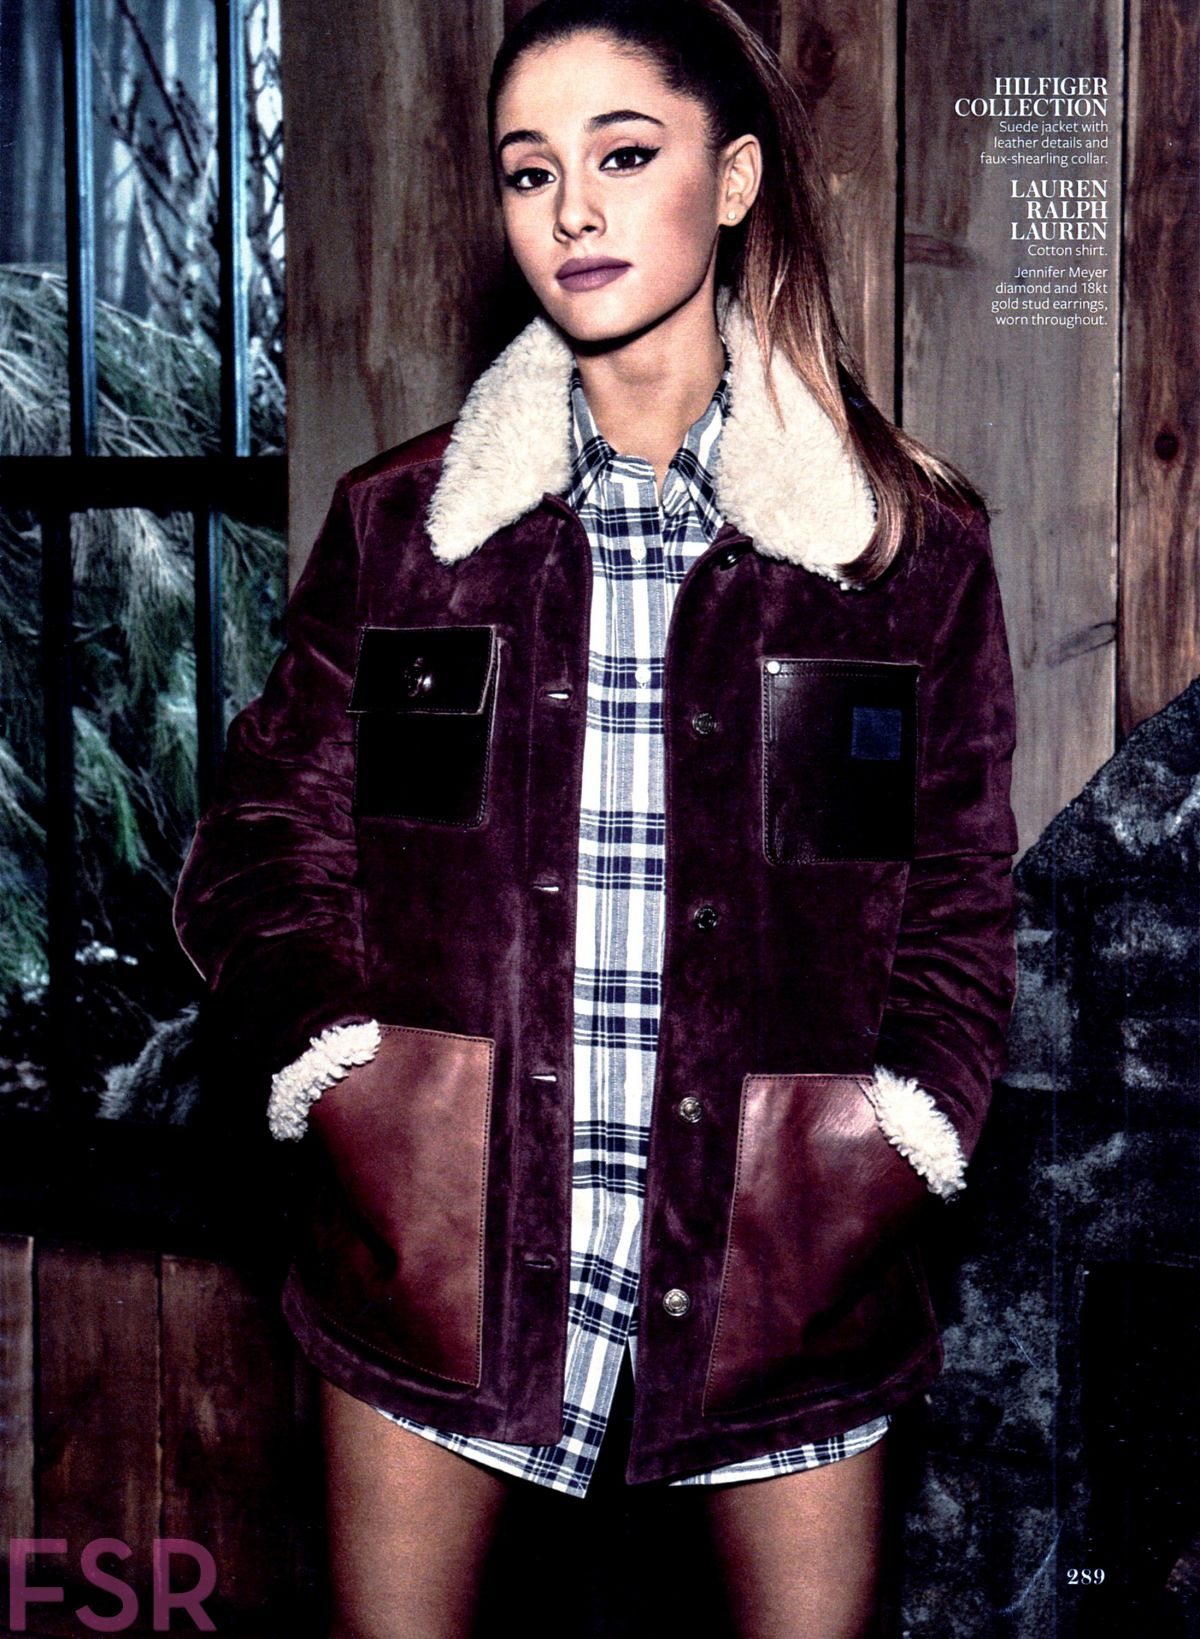 ARIANA GRANDE in Instyle Magazine, December 2014 Issue